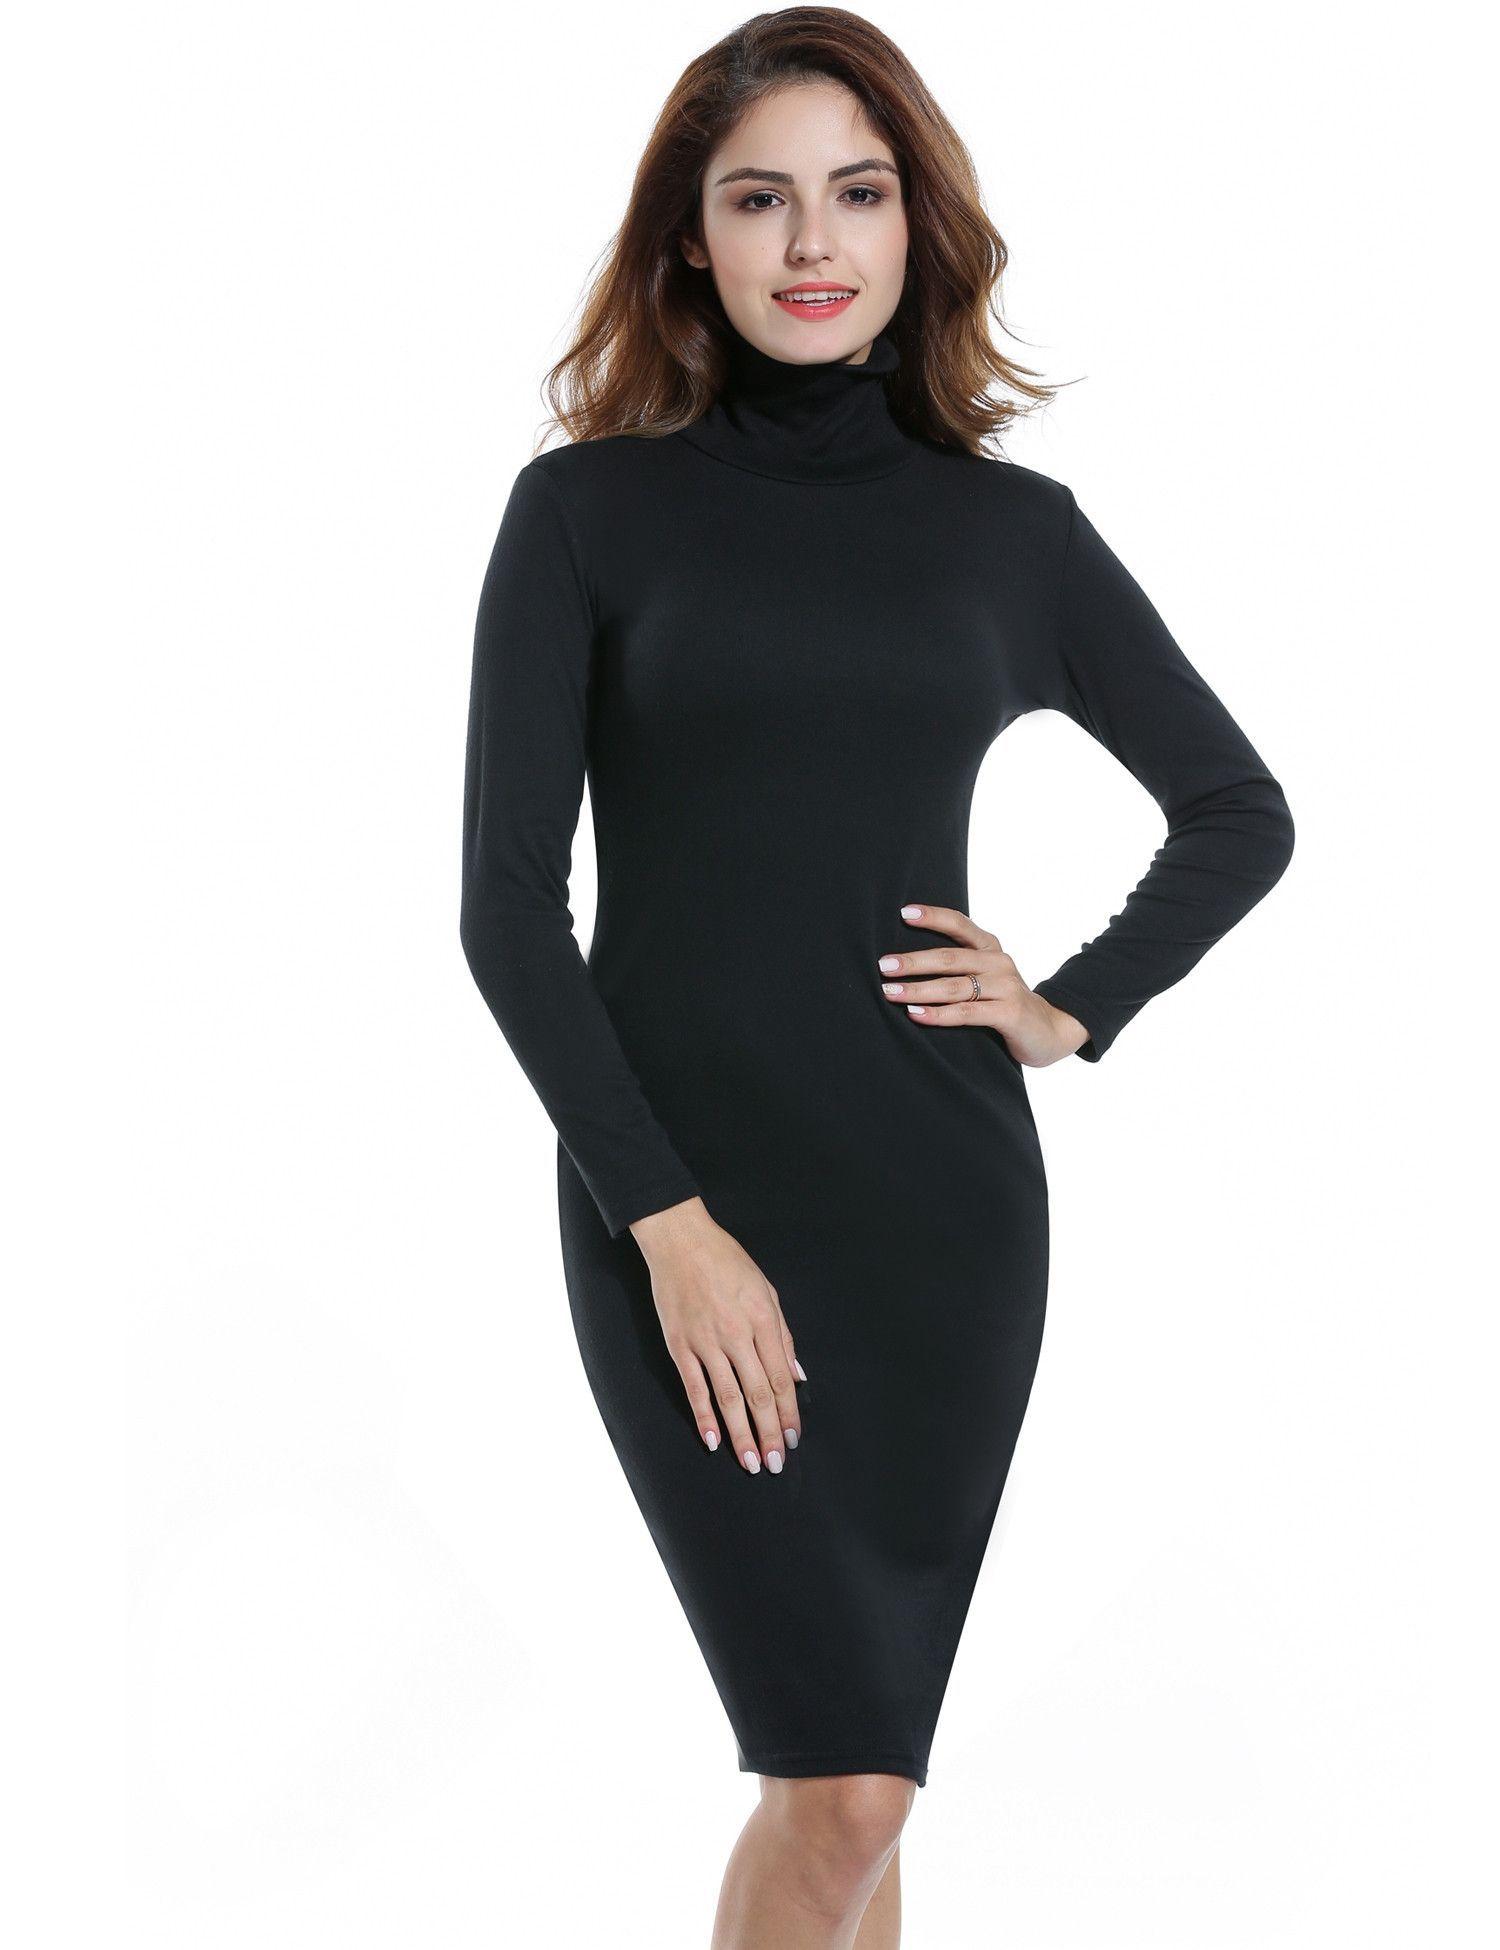 Black turtleneck long sleeve bodyson stretch going out dress wish